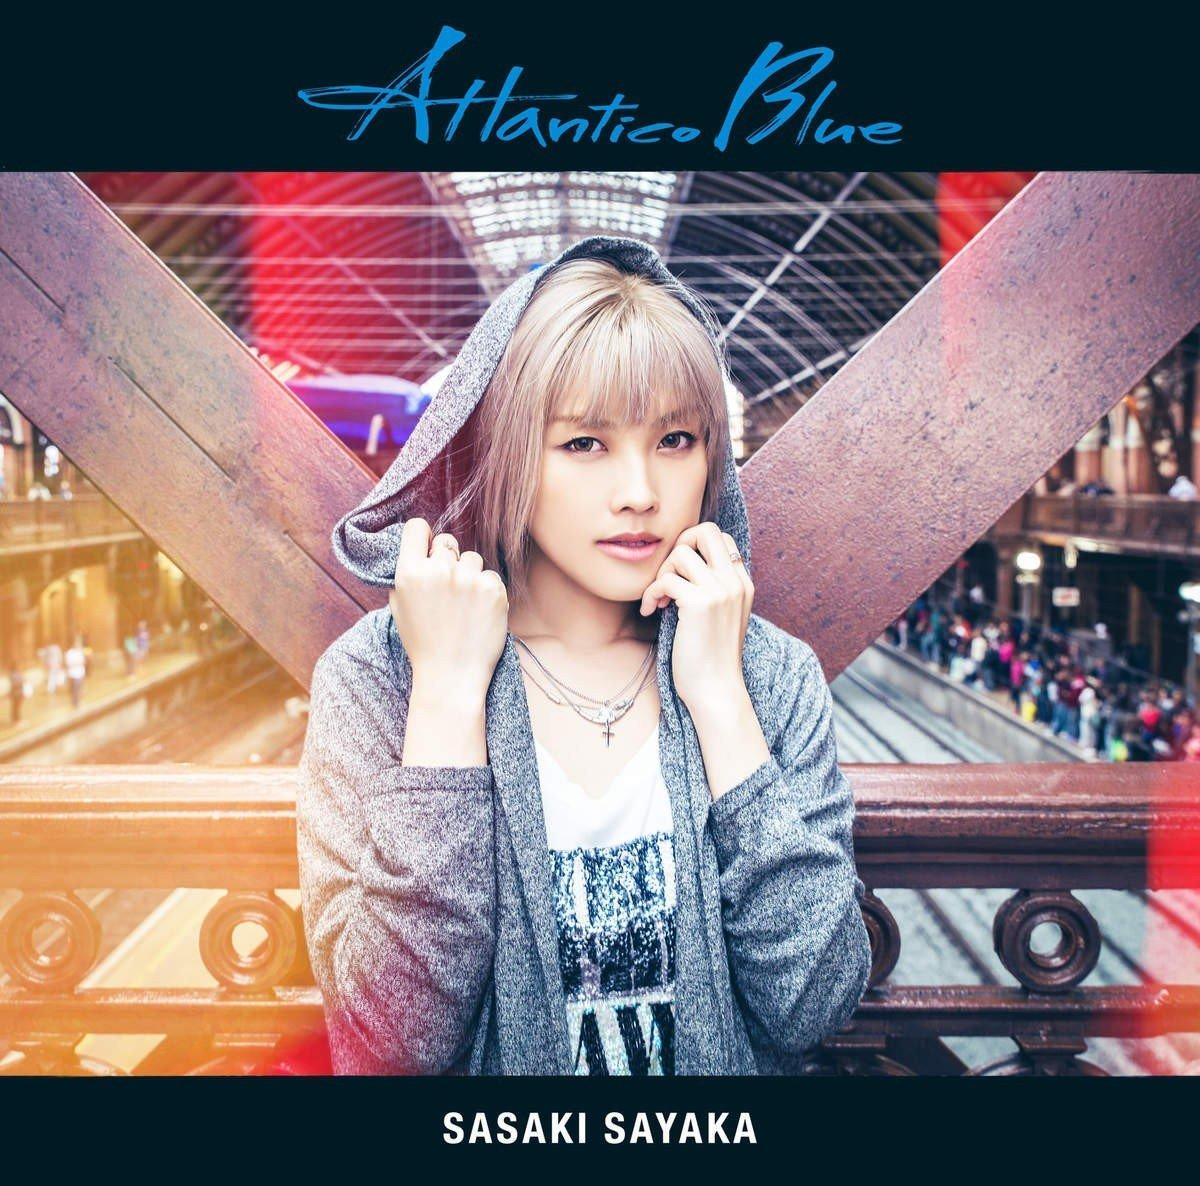 [Album] 佐咲紗花 (Sayaka Sasaki) – Atlantico Blue [FLAC / 24bit Lossless / WEB] [2015.11.18]